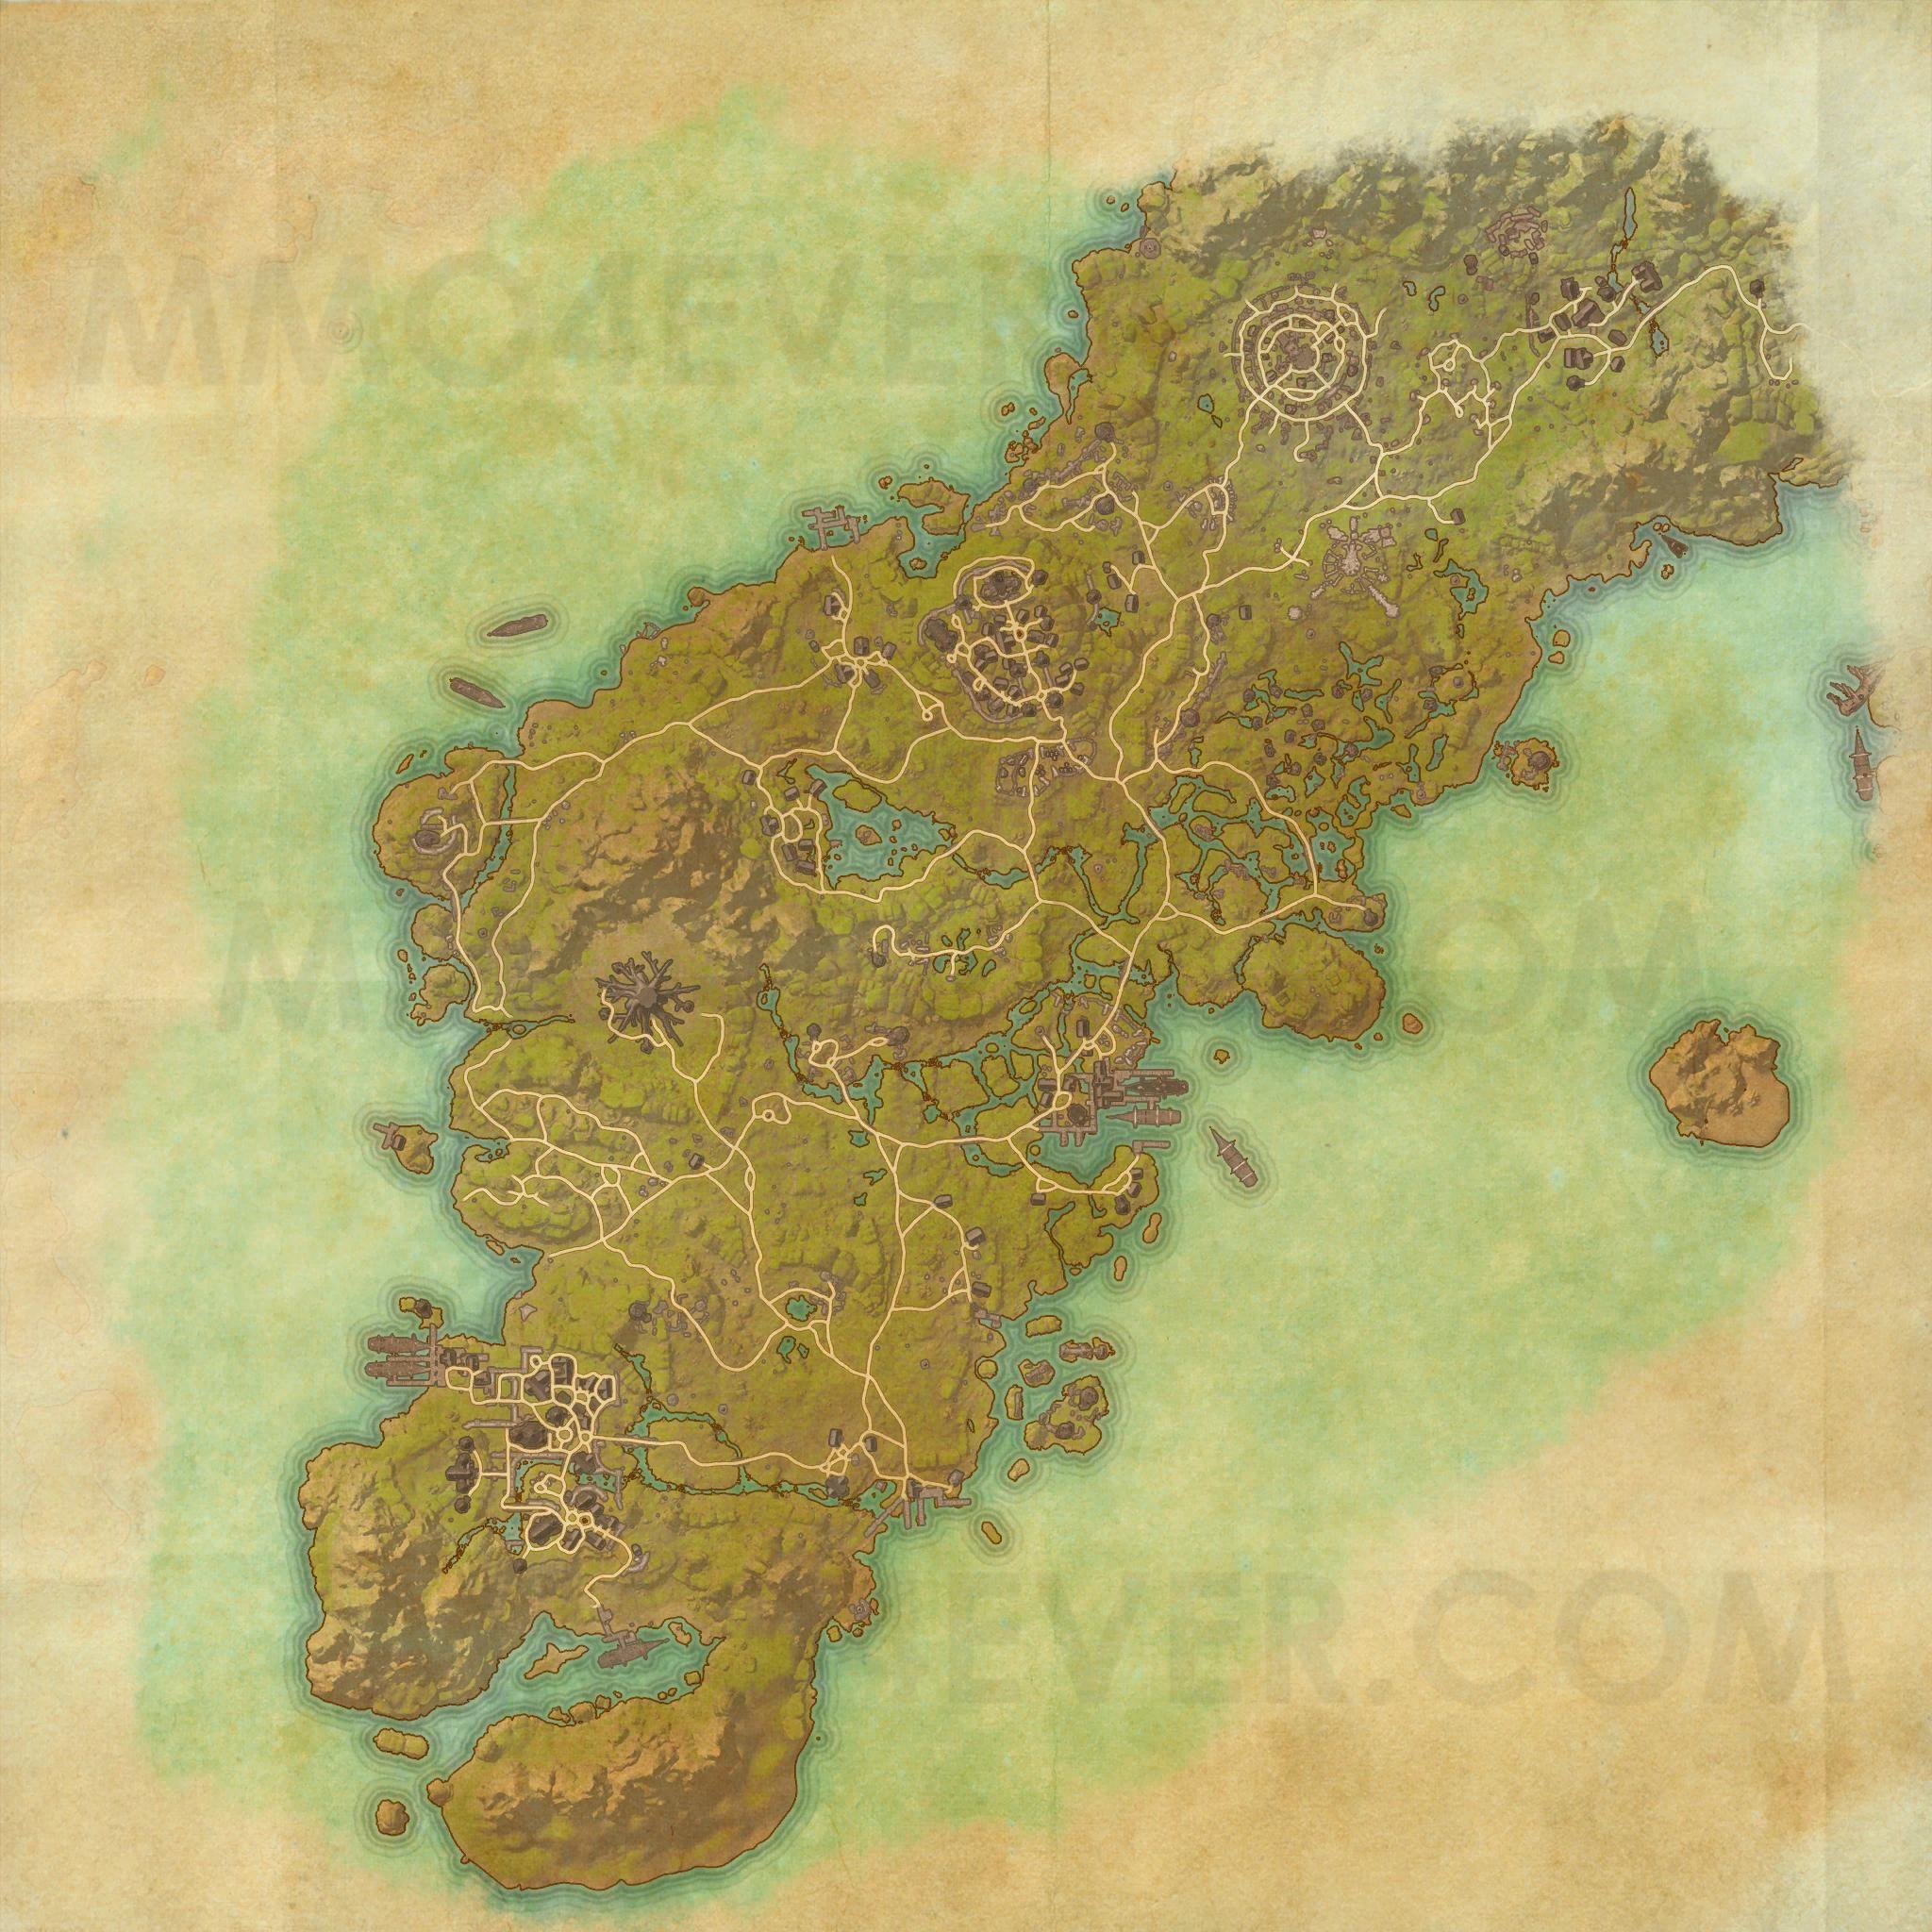 Glenumbra - Map - The Elder Scrolls Online Maps